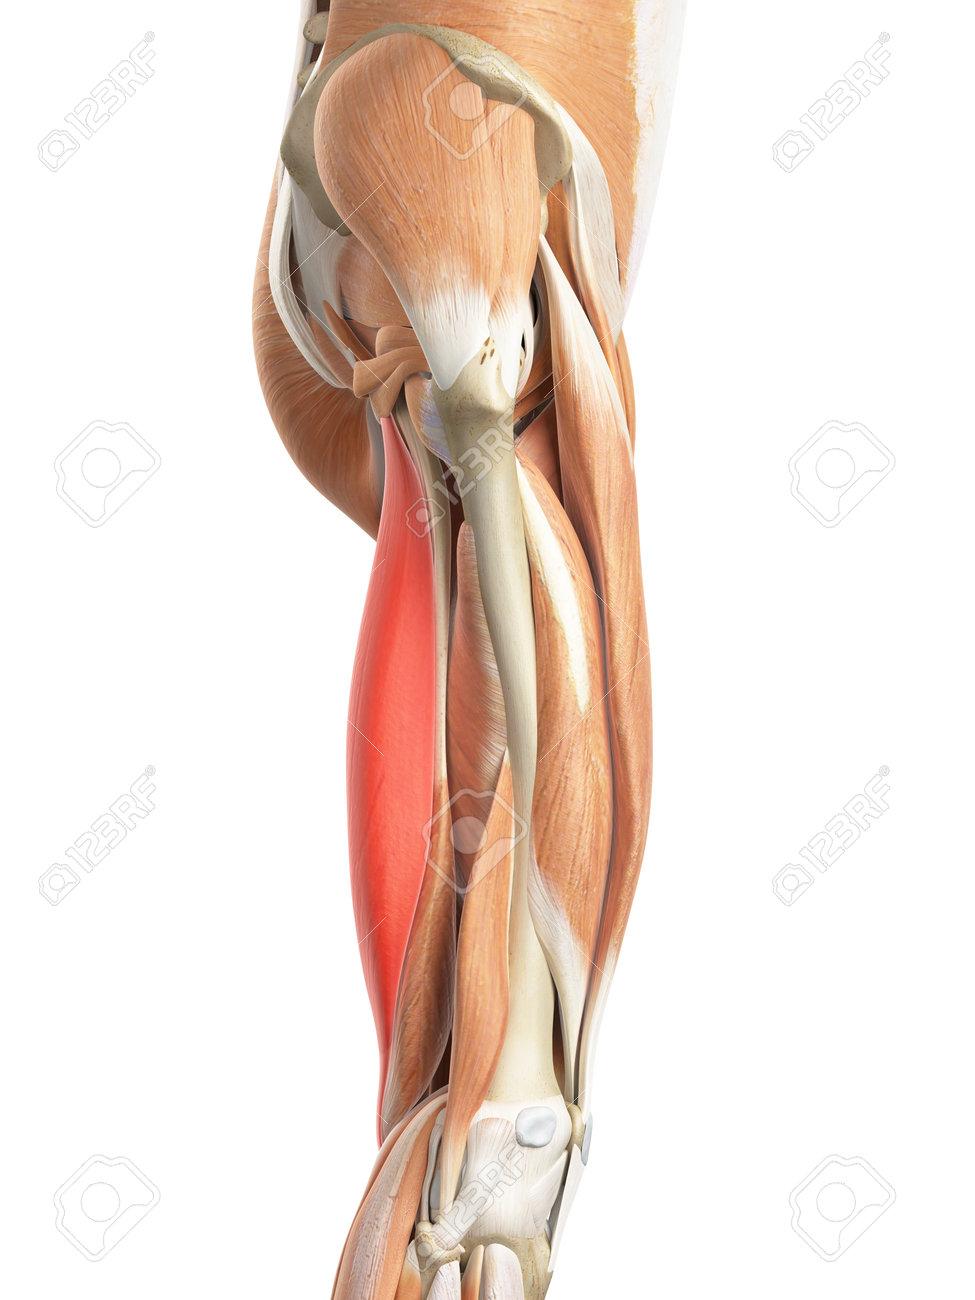 Medically Accurate Illustration Of The Semitendinosus Stock Photo ...